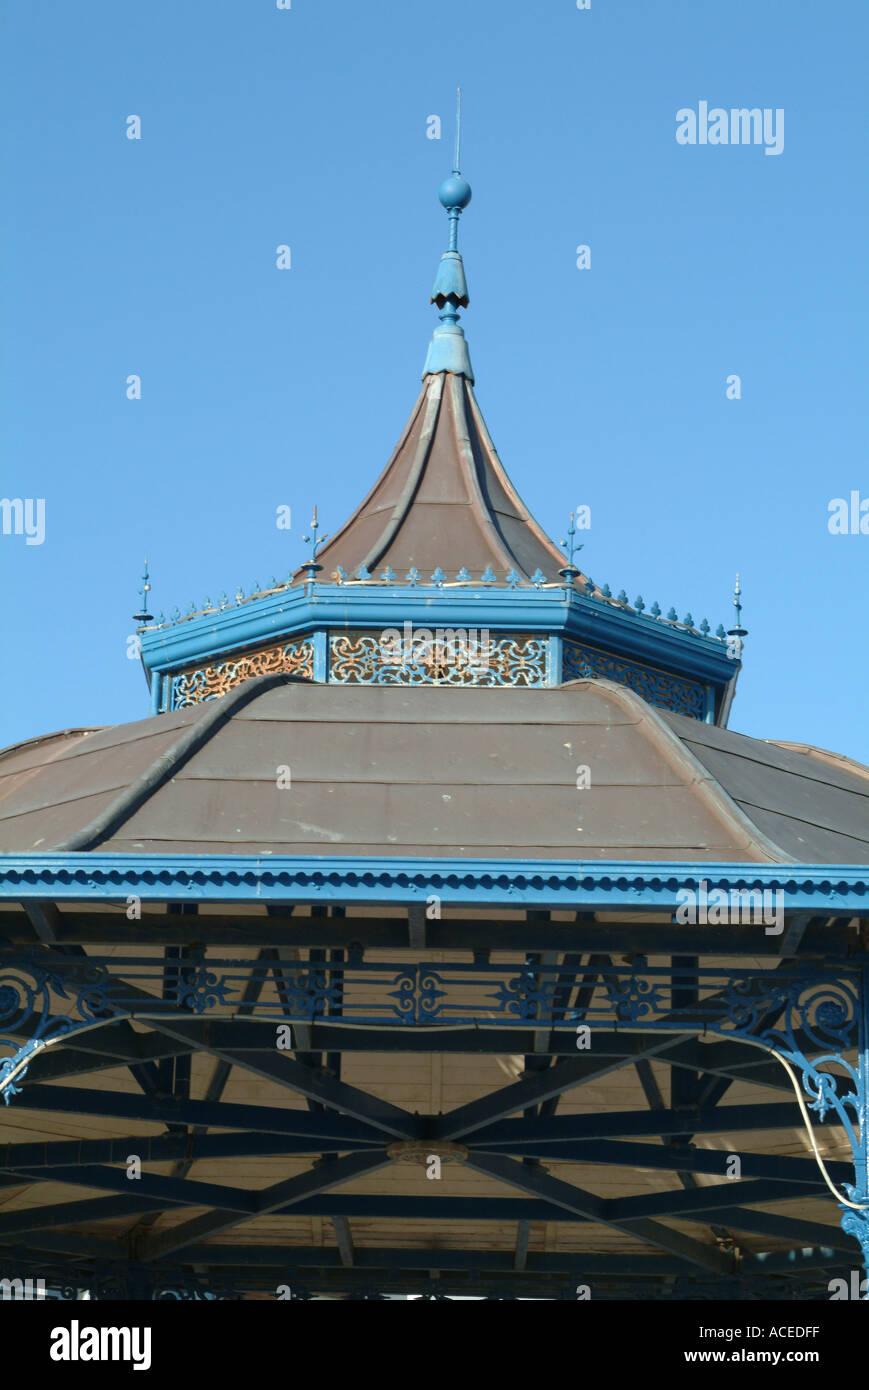 Victorian Regency Bandstand Roof on Promenade at Bognor Regis West Sussex England United Kingdom UK Stock Photo